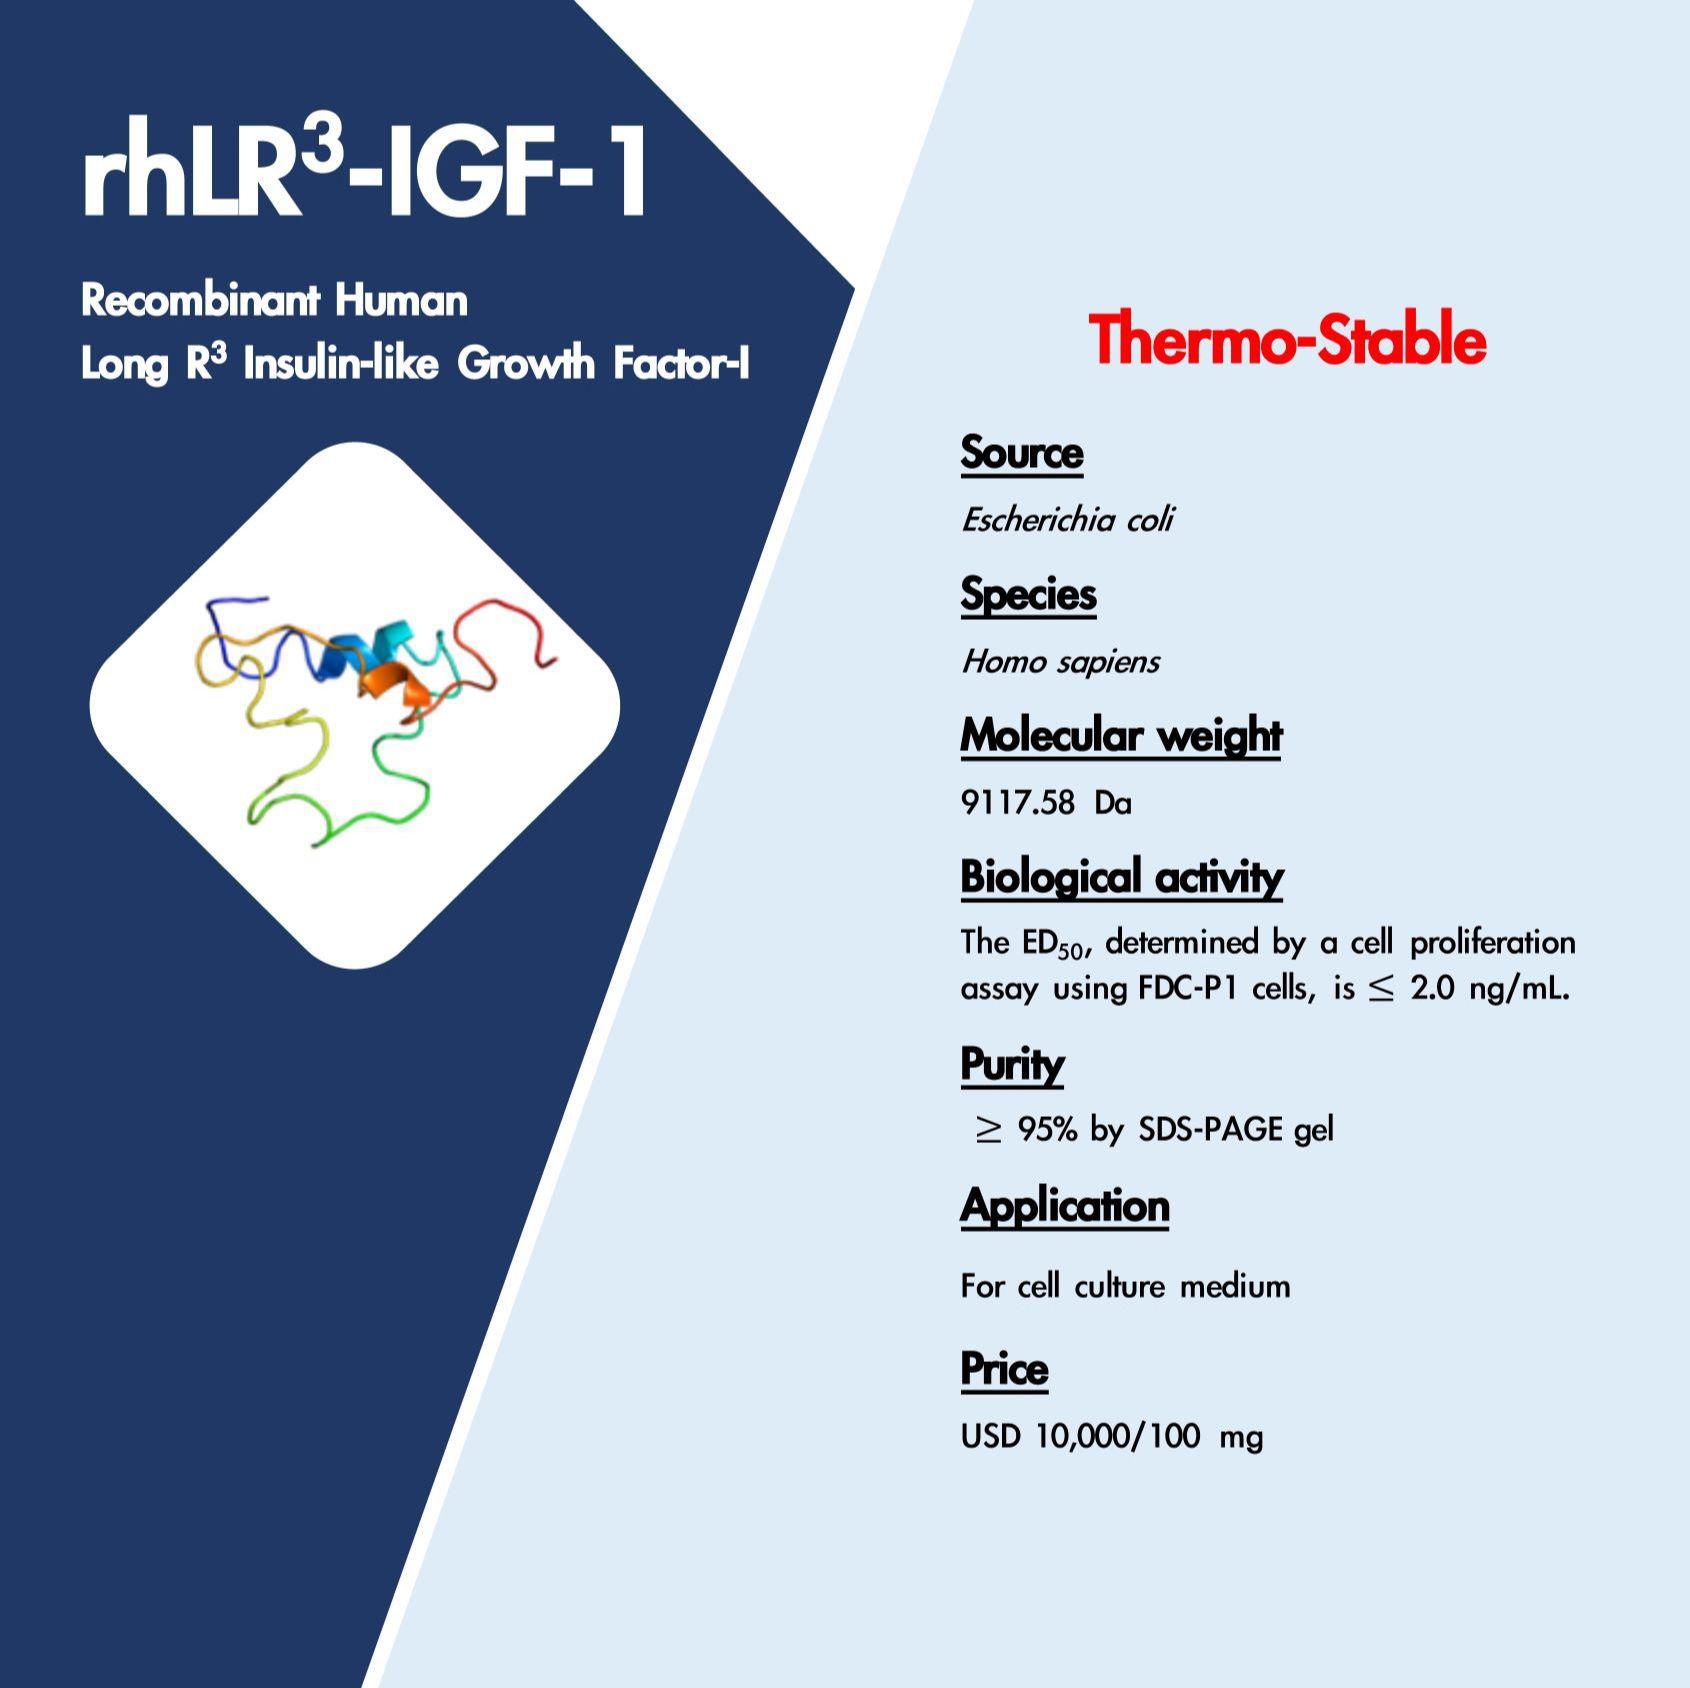 LR3-IGF-1